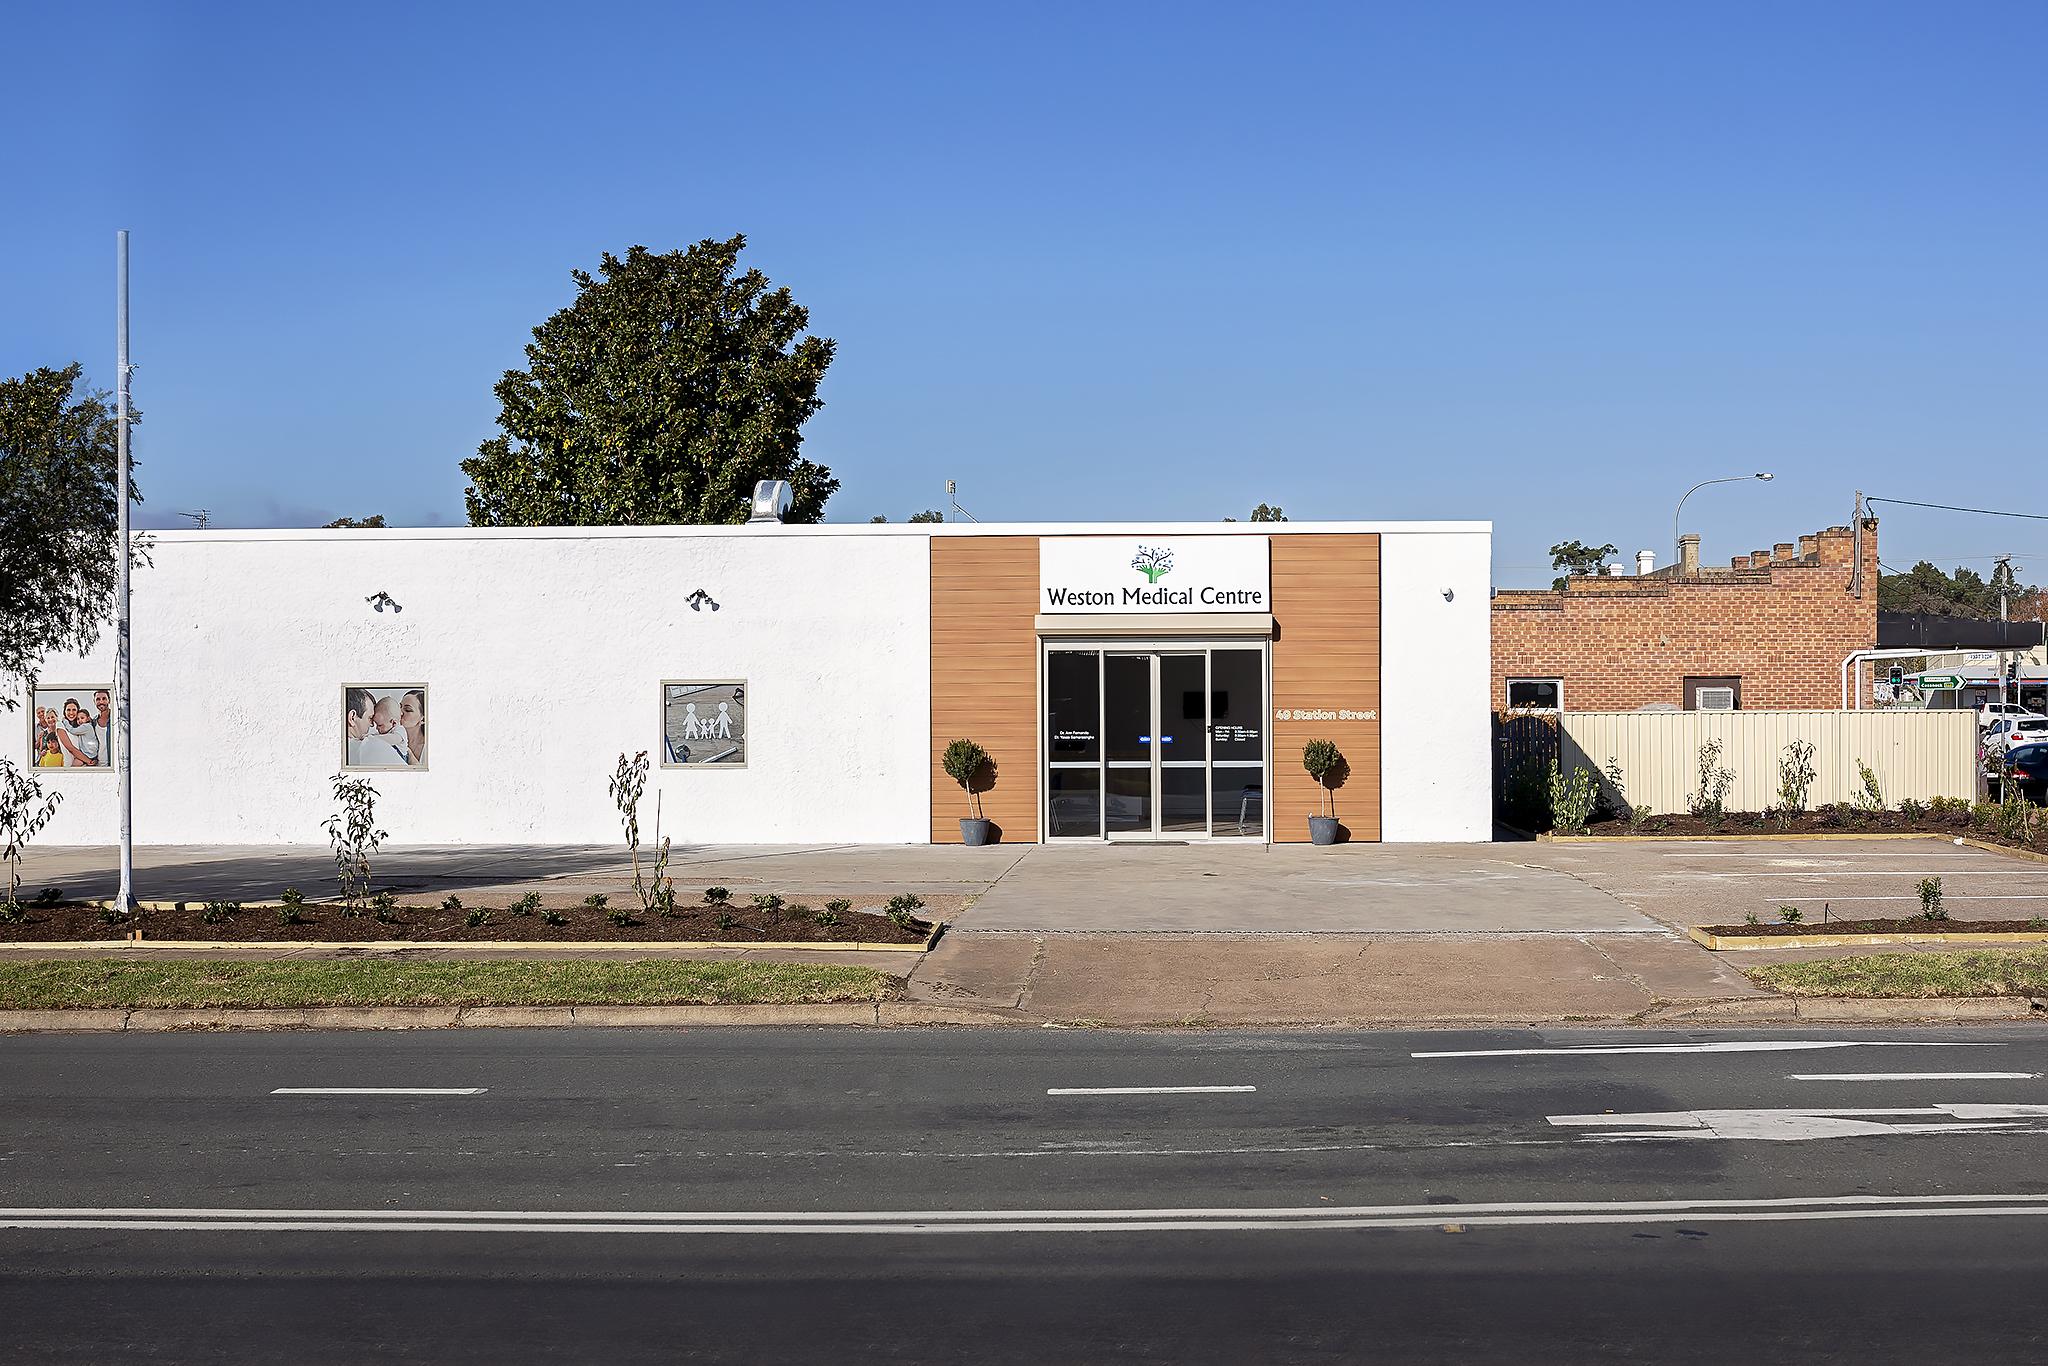 weston medical centre